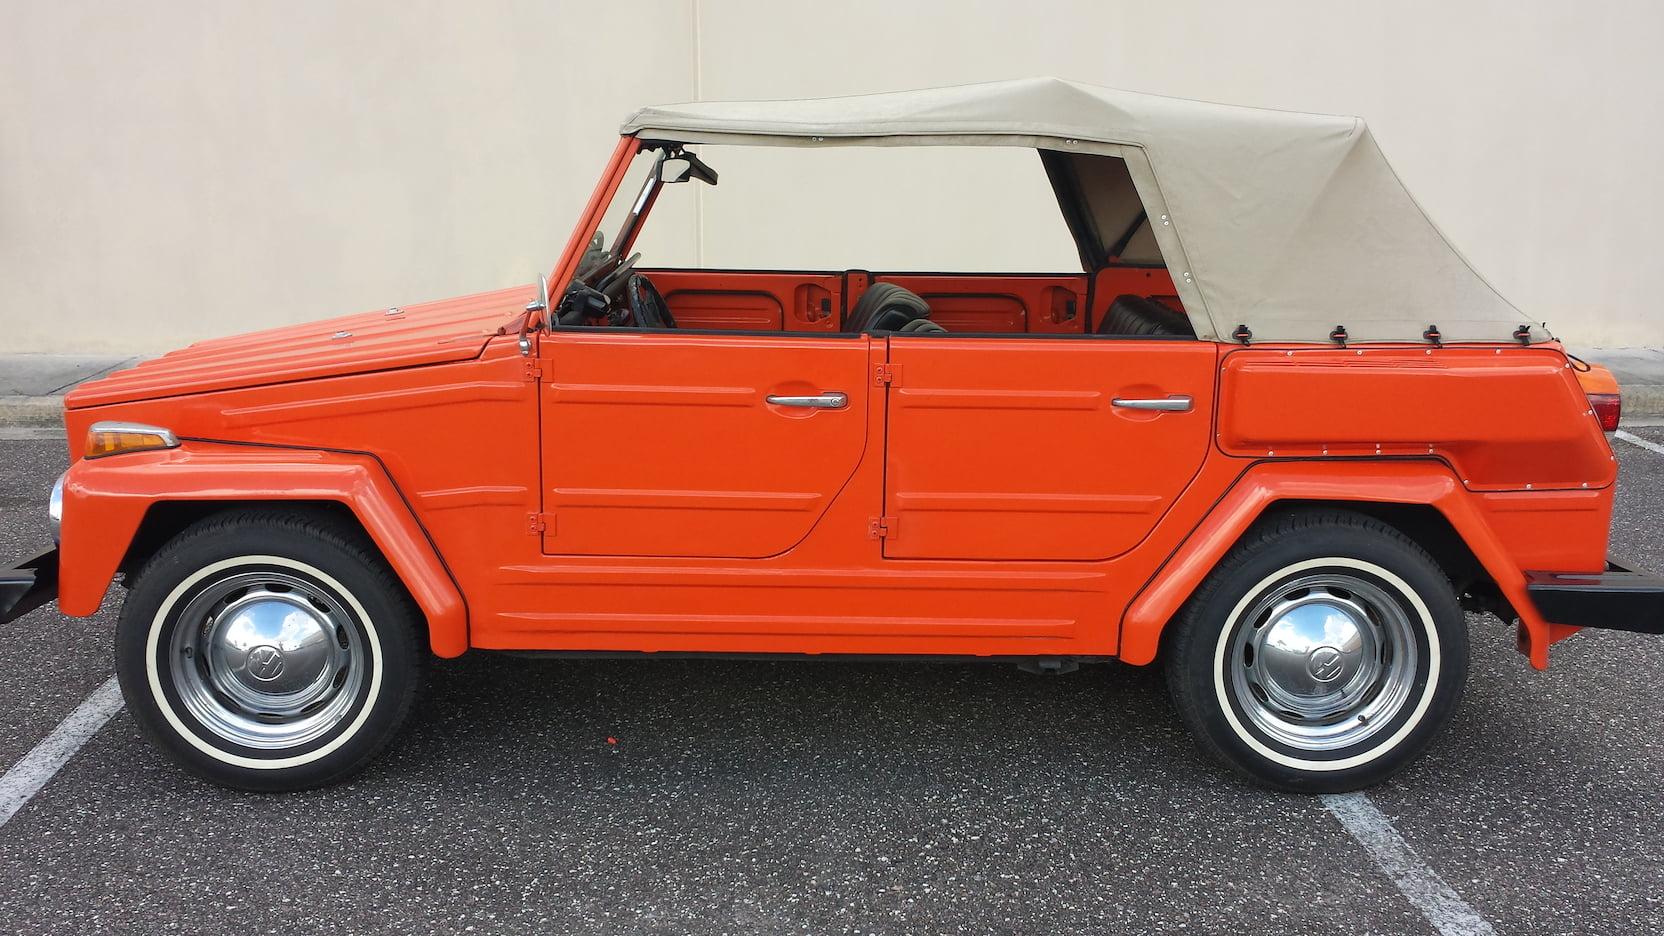 1974 Volkswagen Thing side